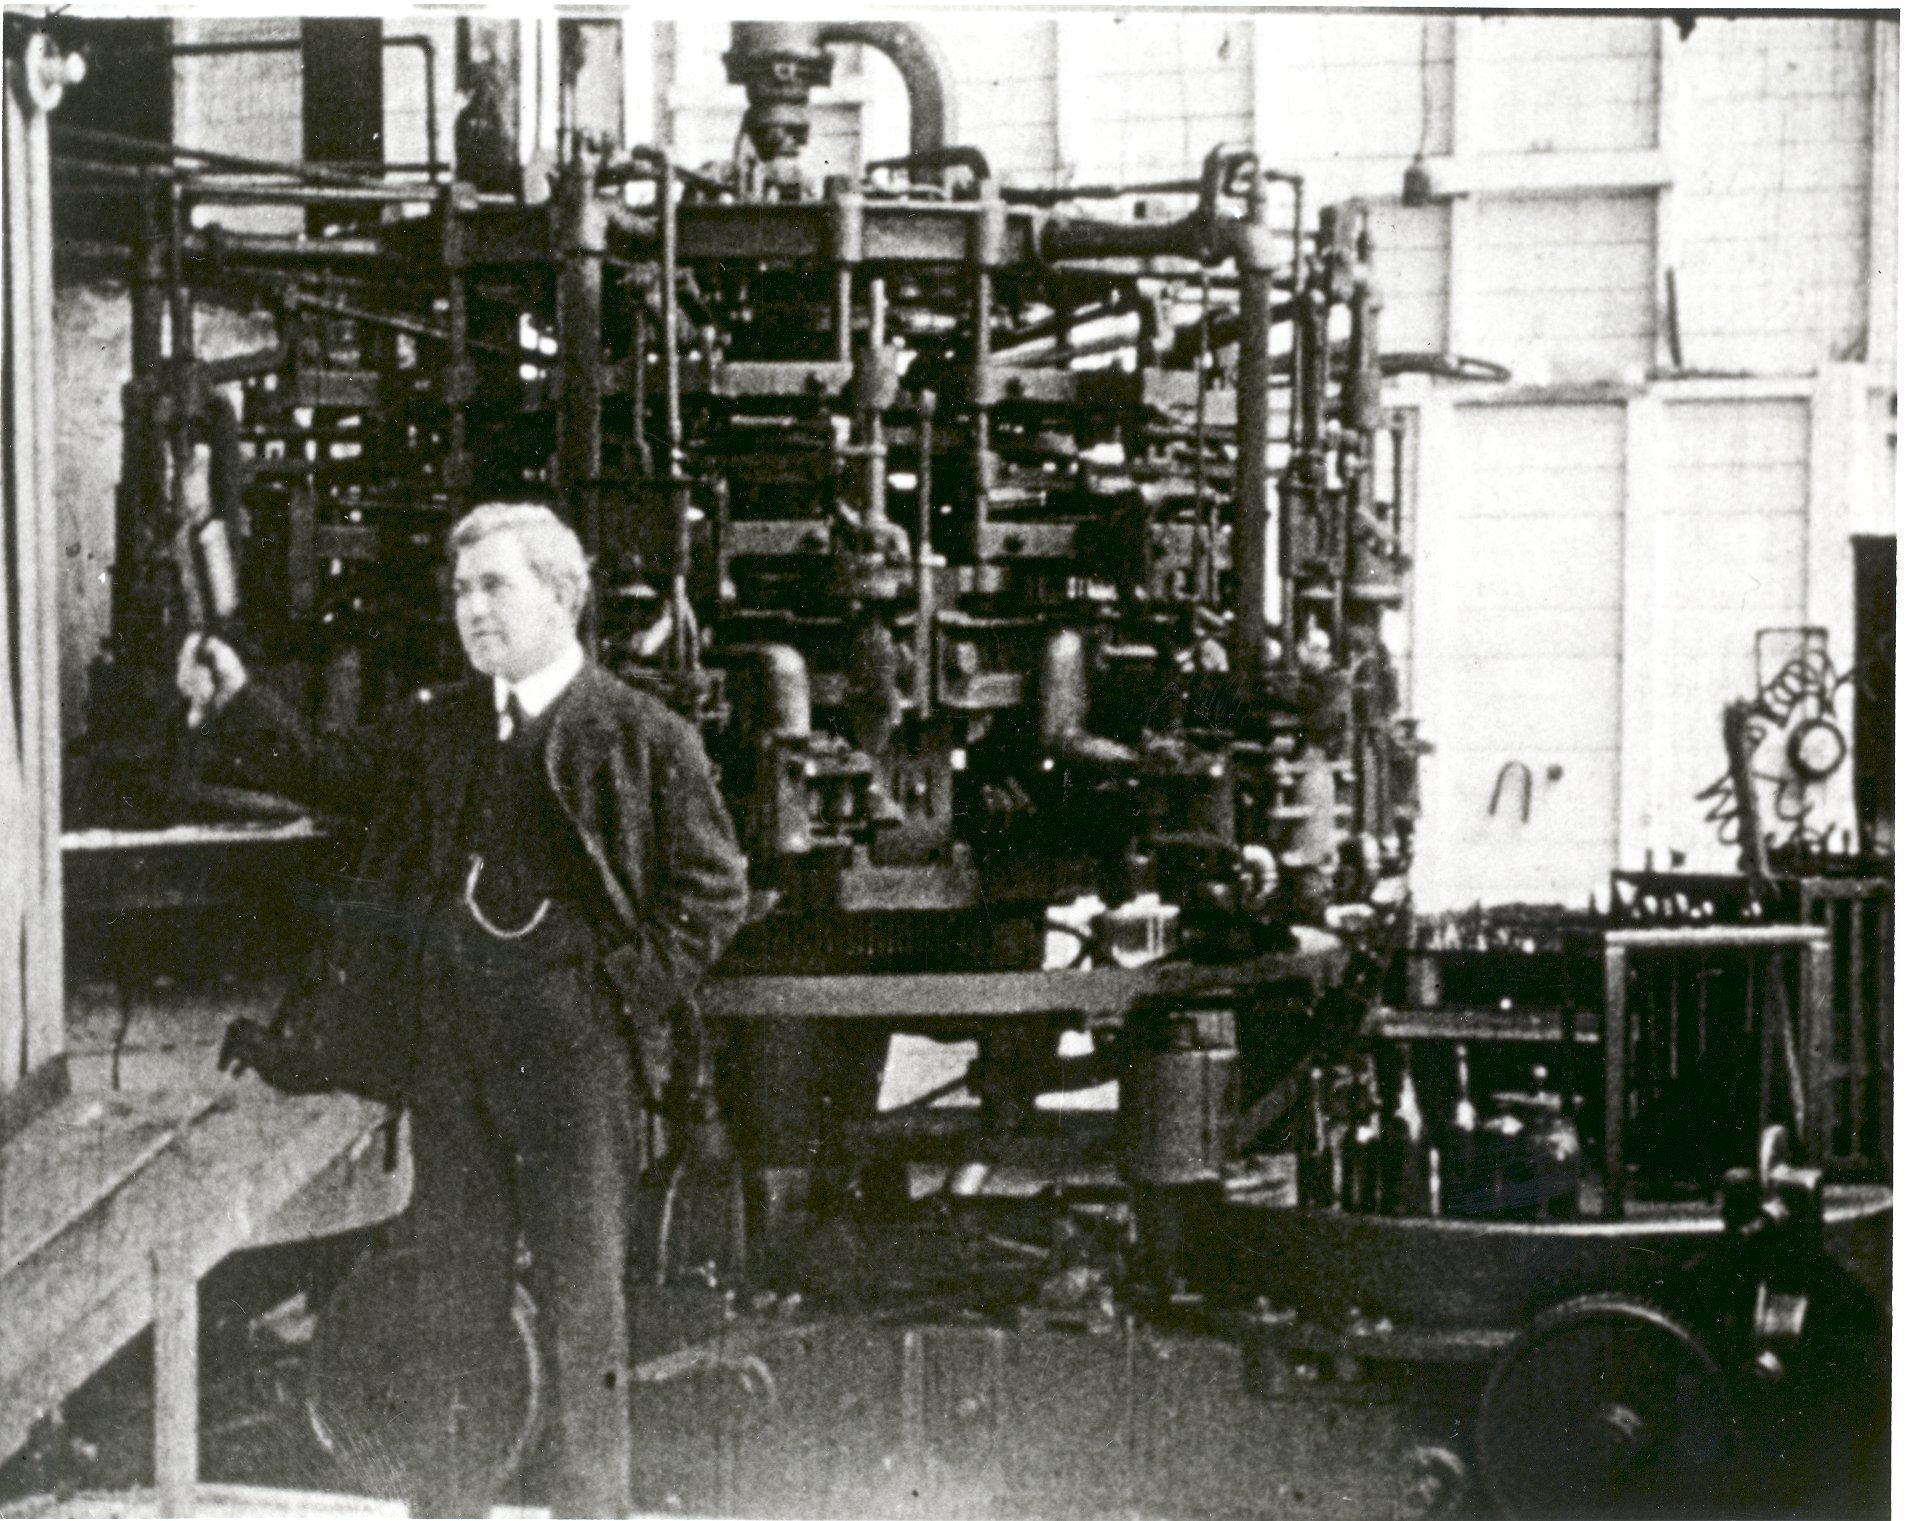 Photo of Michael Owens with his bottle-making machine c. 1910. Photo from utoledo.edu